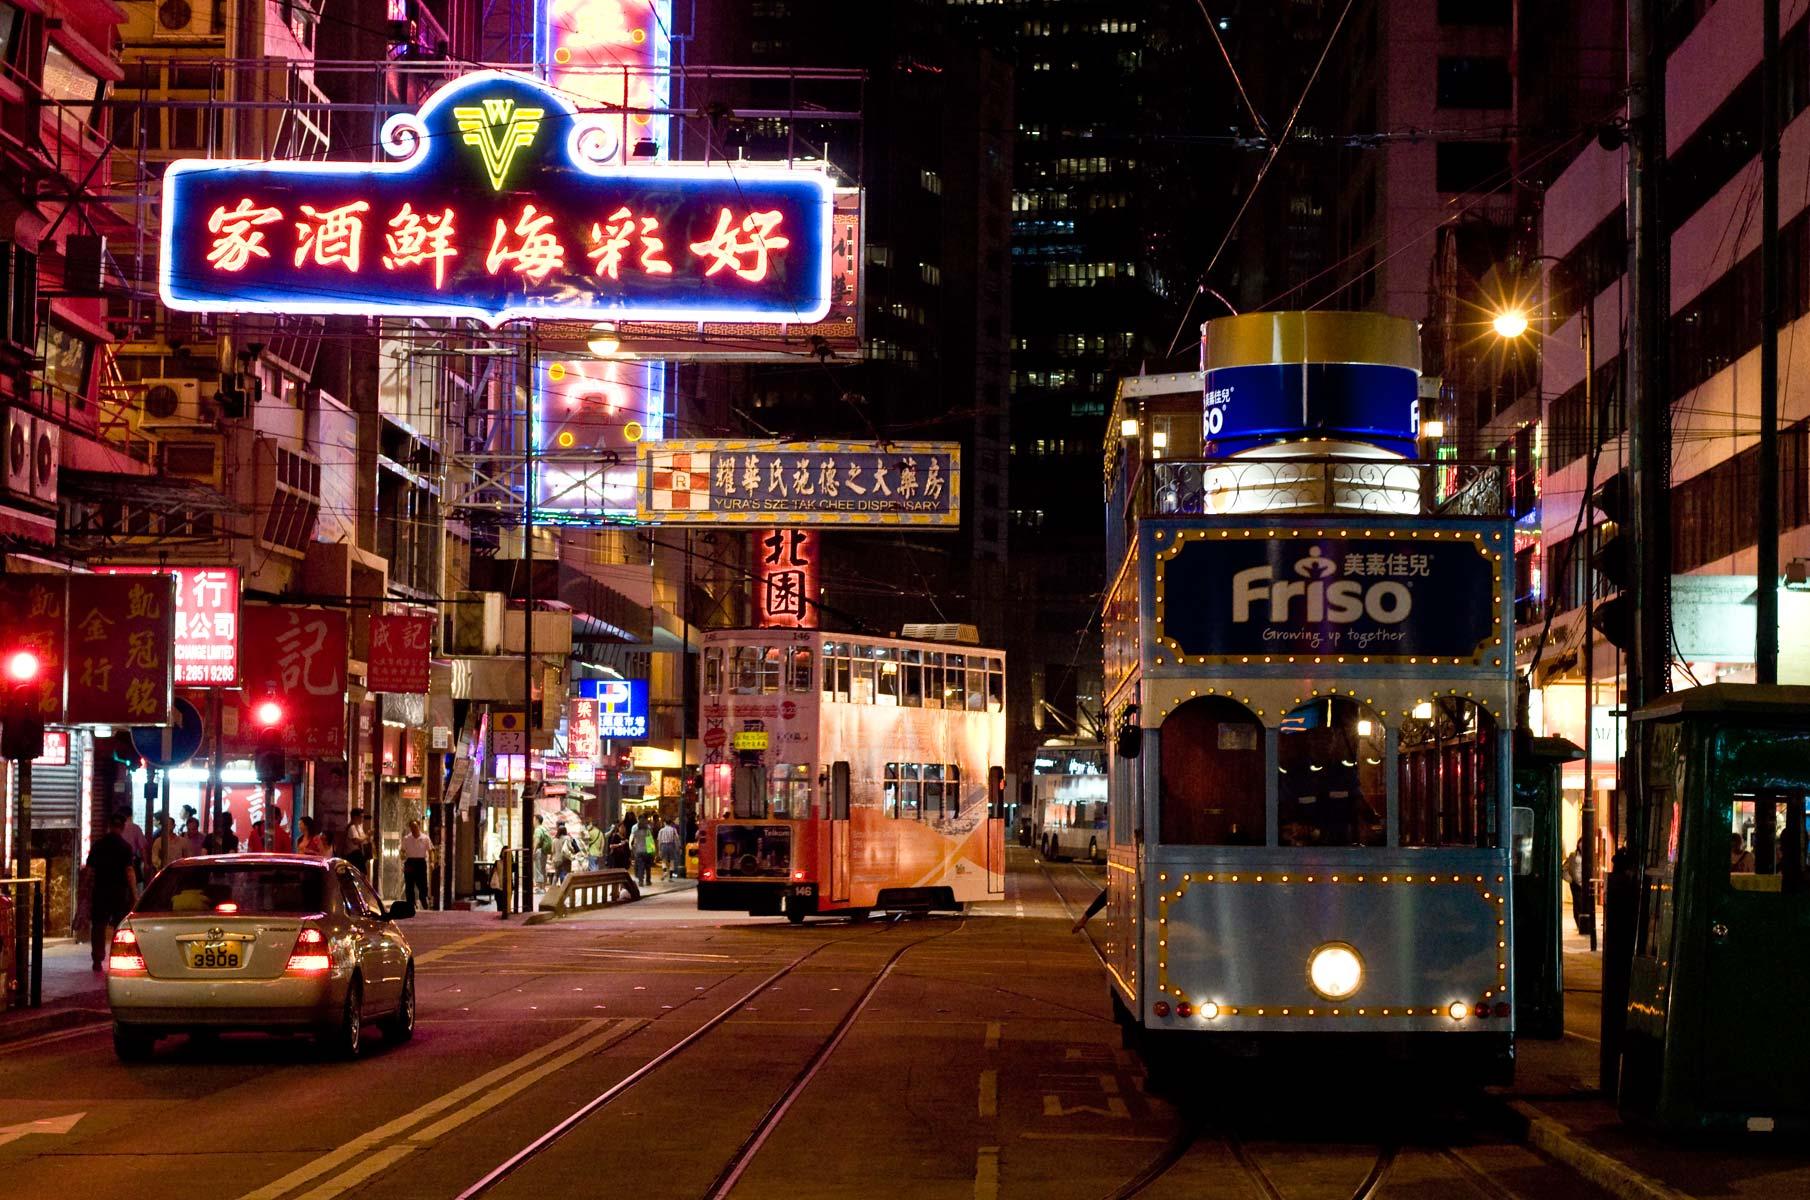 Straßenbahnen auf Hongkong Island bei Nacht